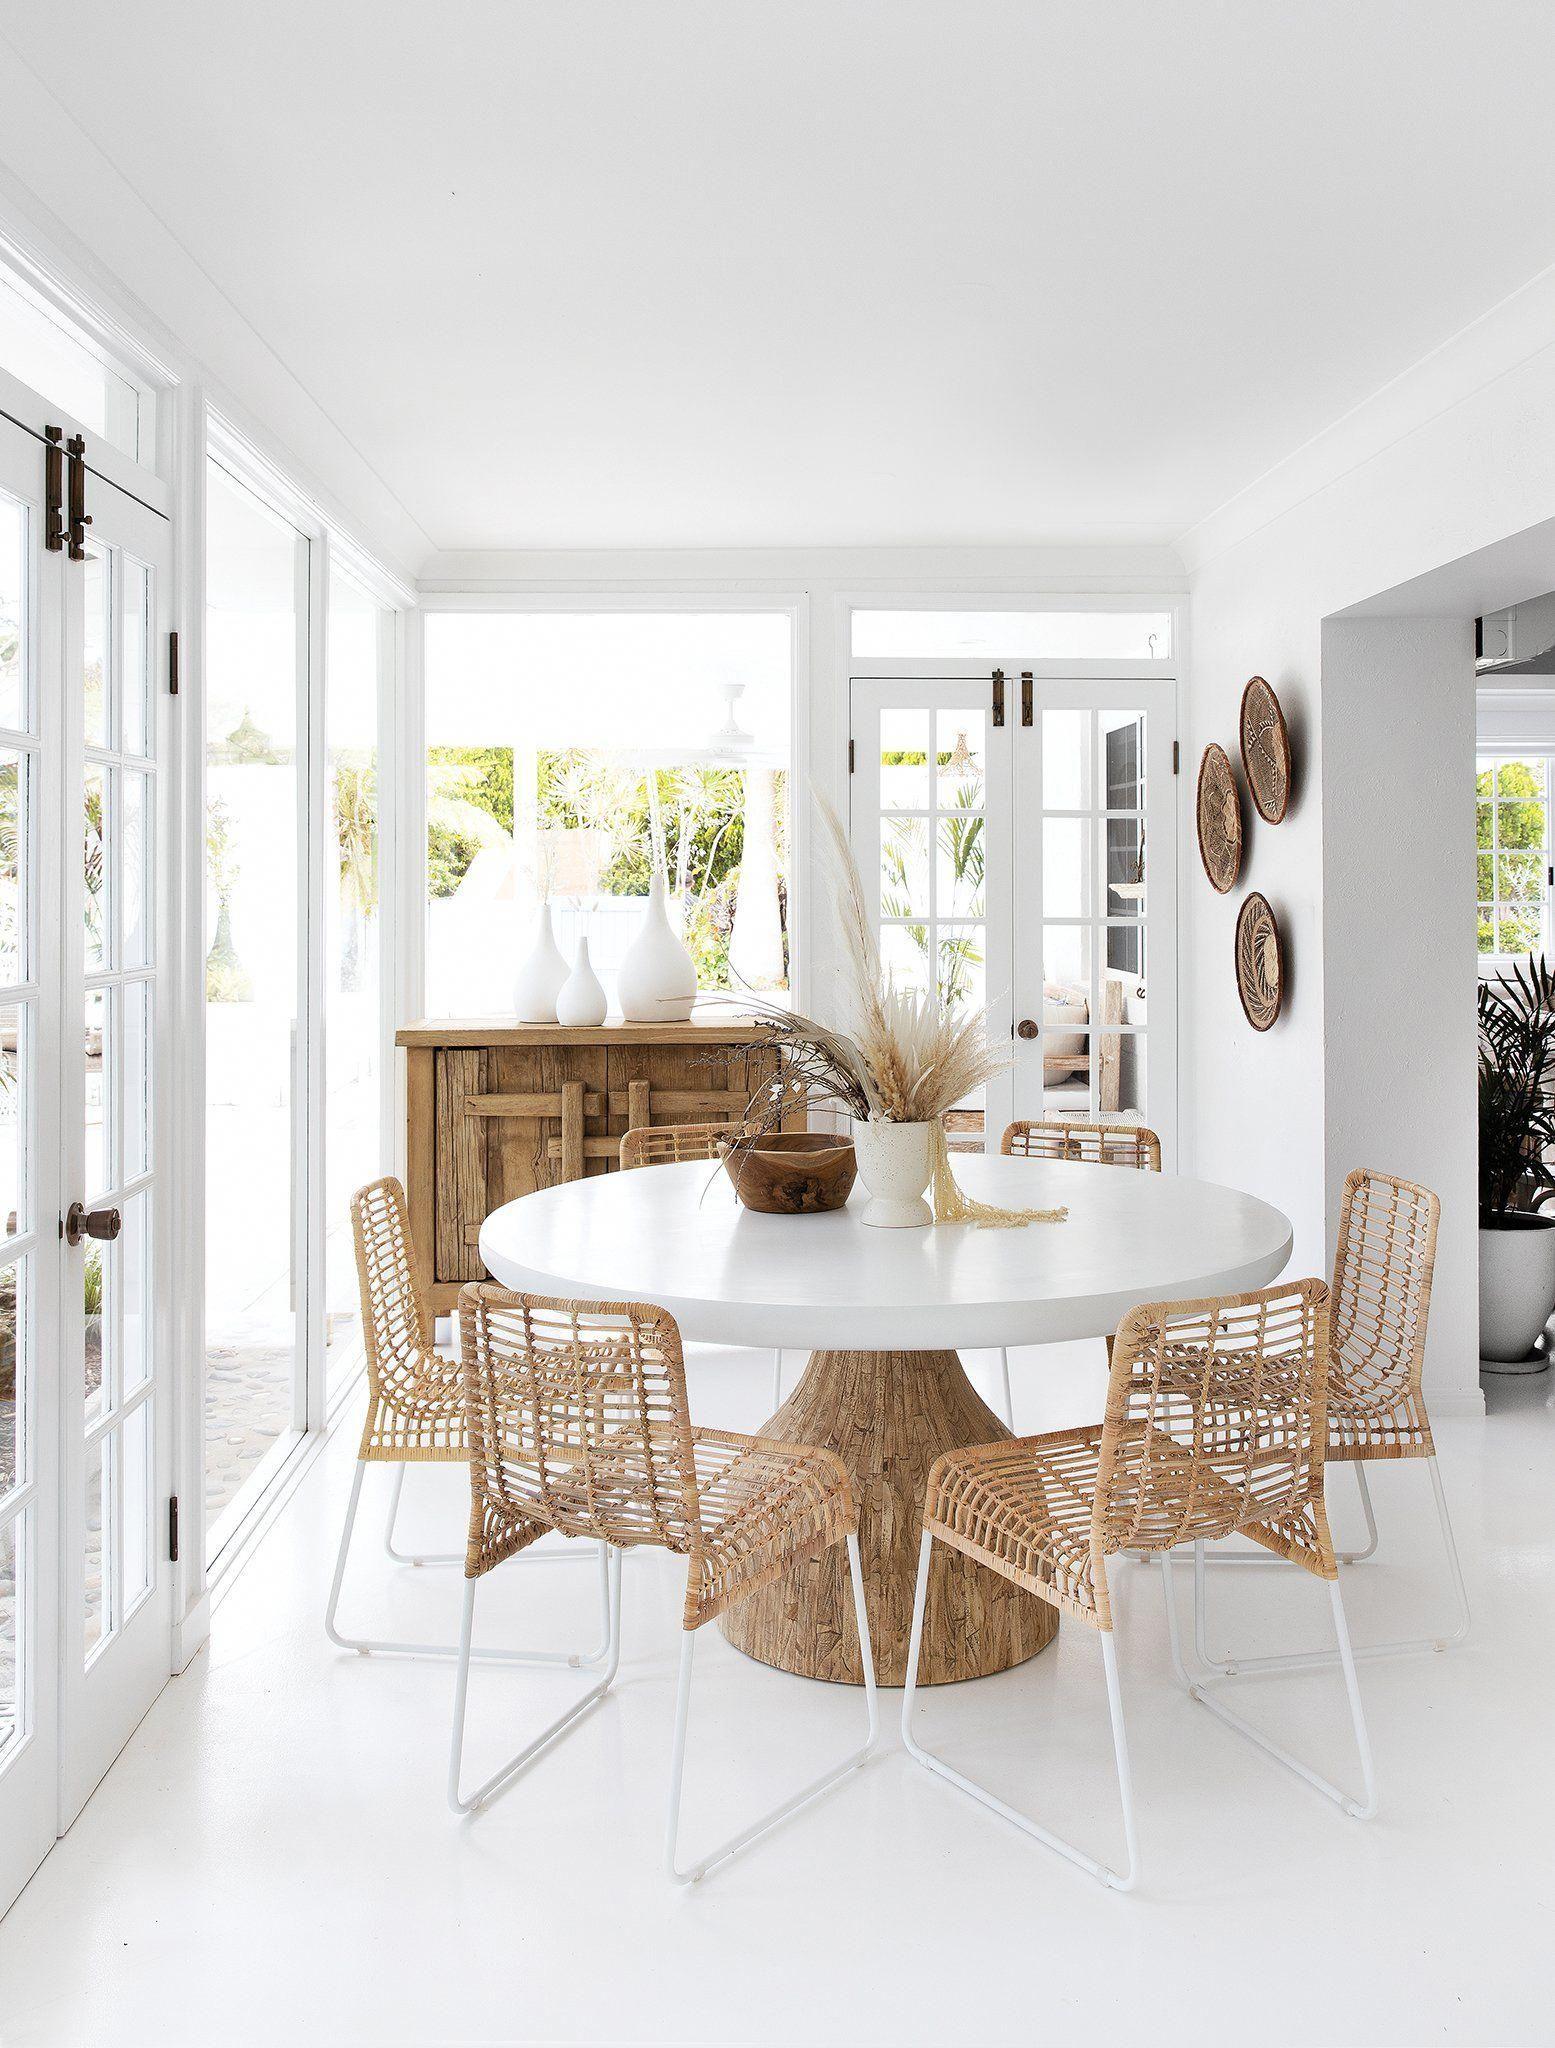 Free Software For Interior Design Schools For Interior Design Near Me Interio Dining Room Design House Interior Home